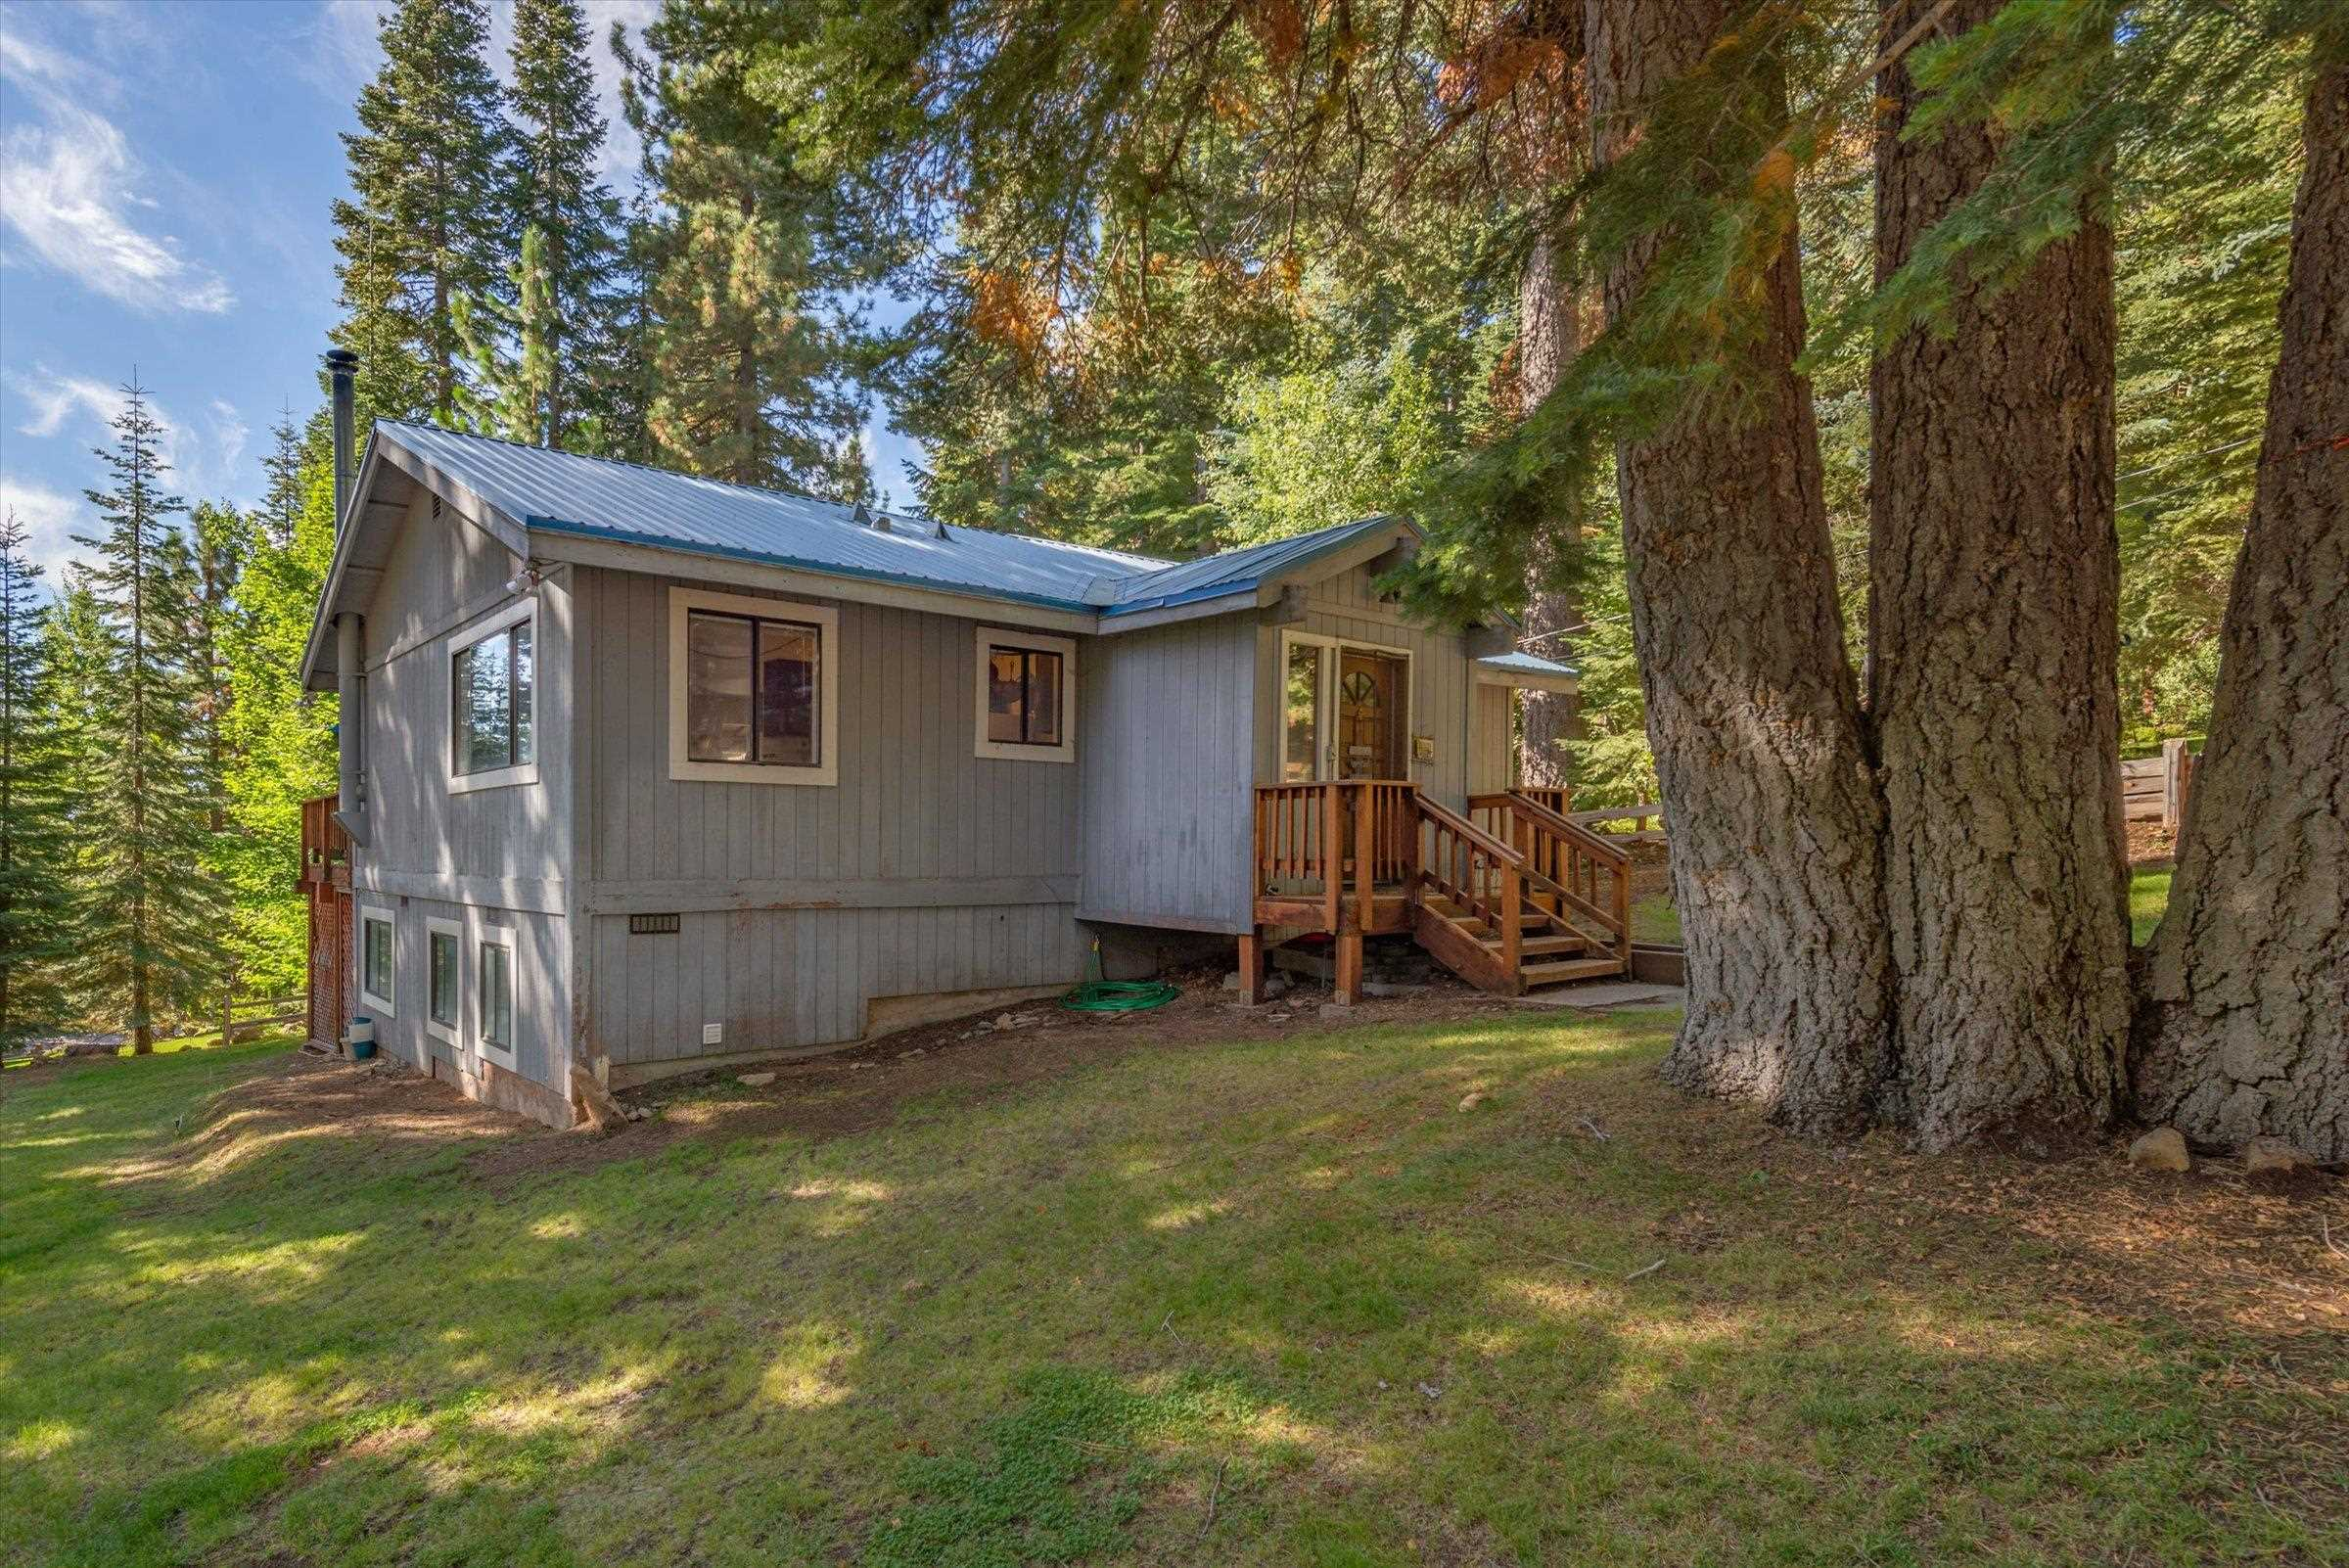 Image for 920 Carnelian Circle, Carnelian Bay, CA 96140